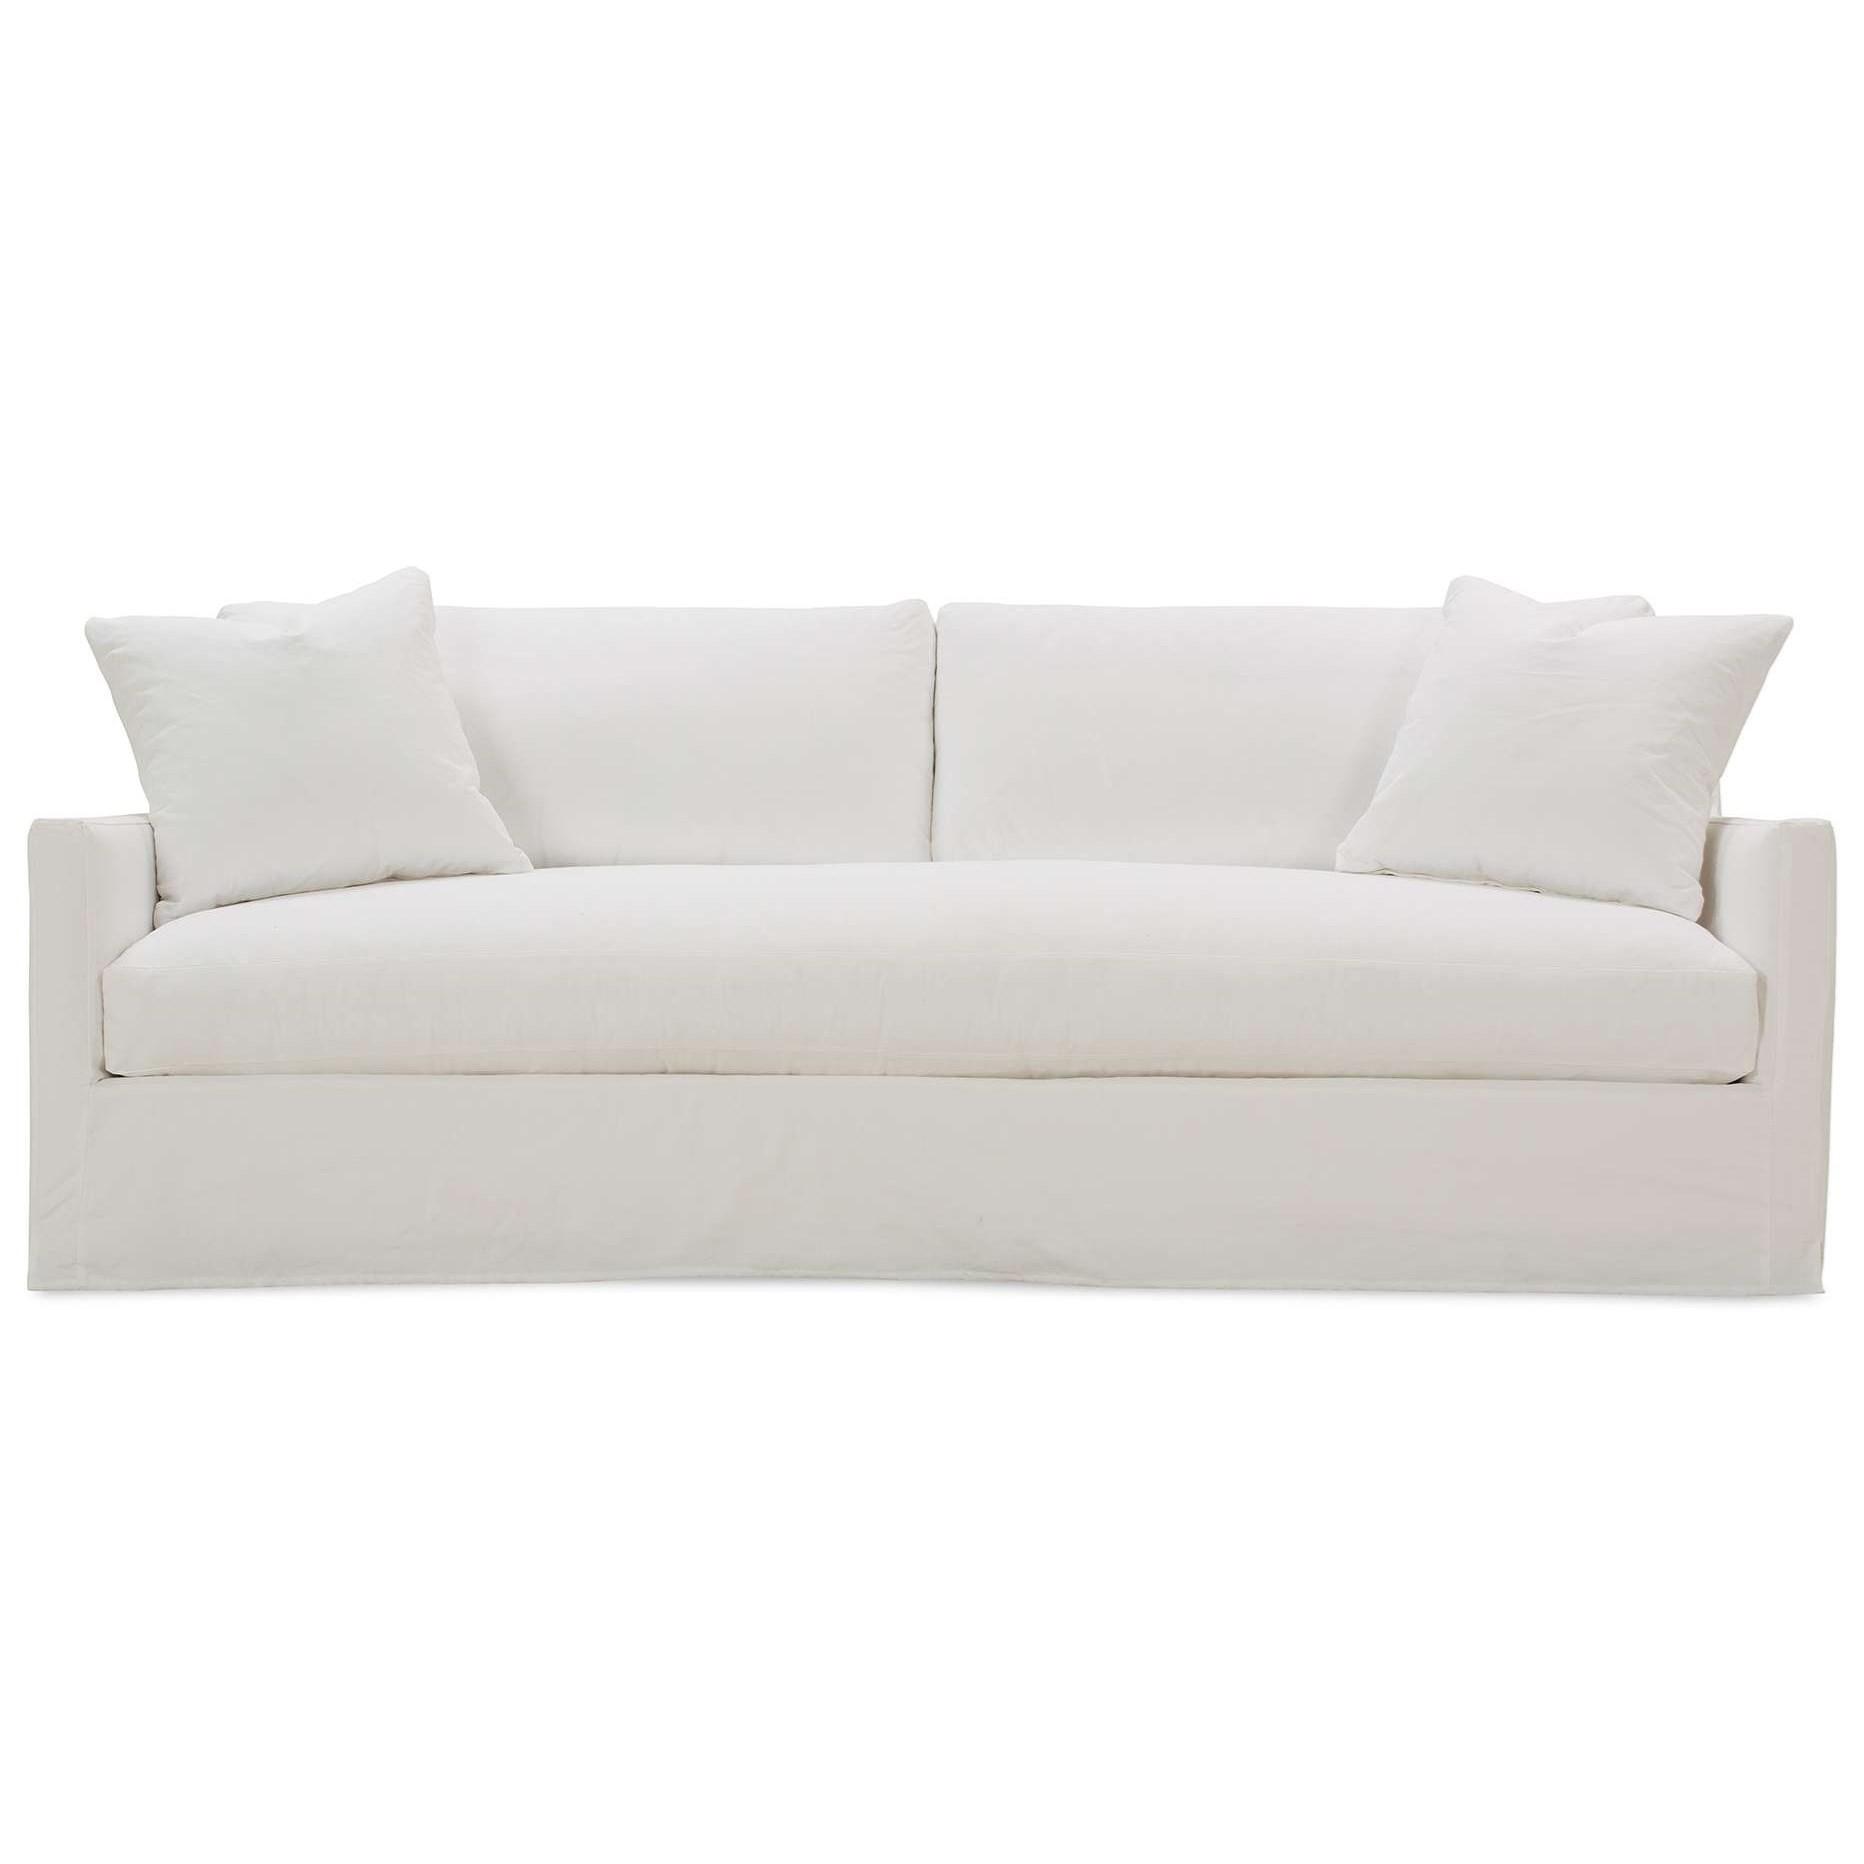 Merritt Bench Cushion Sofa  by Rowe at Steger's Furniture